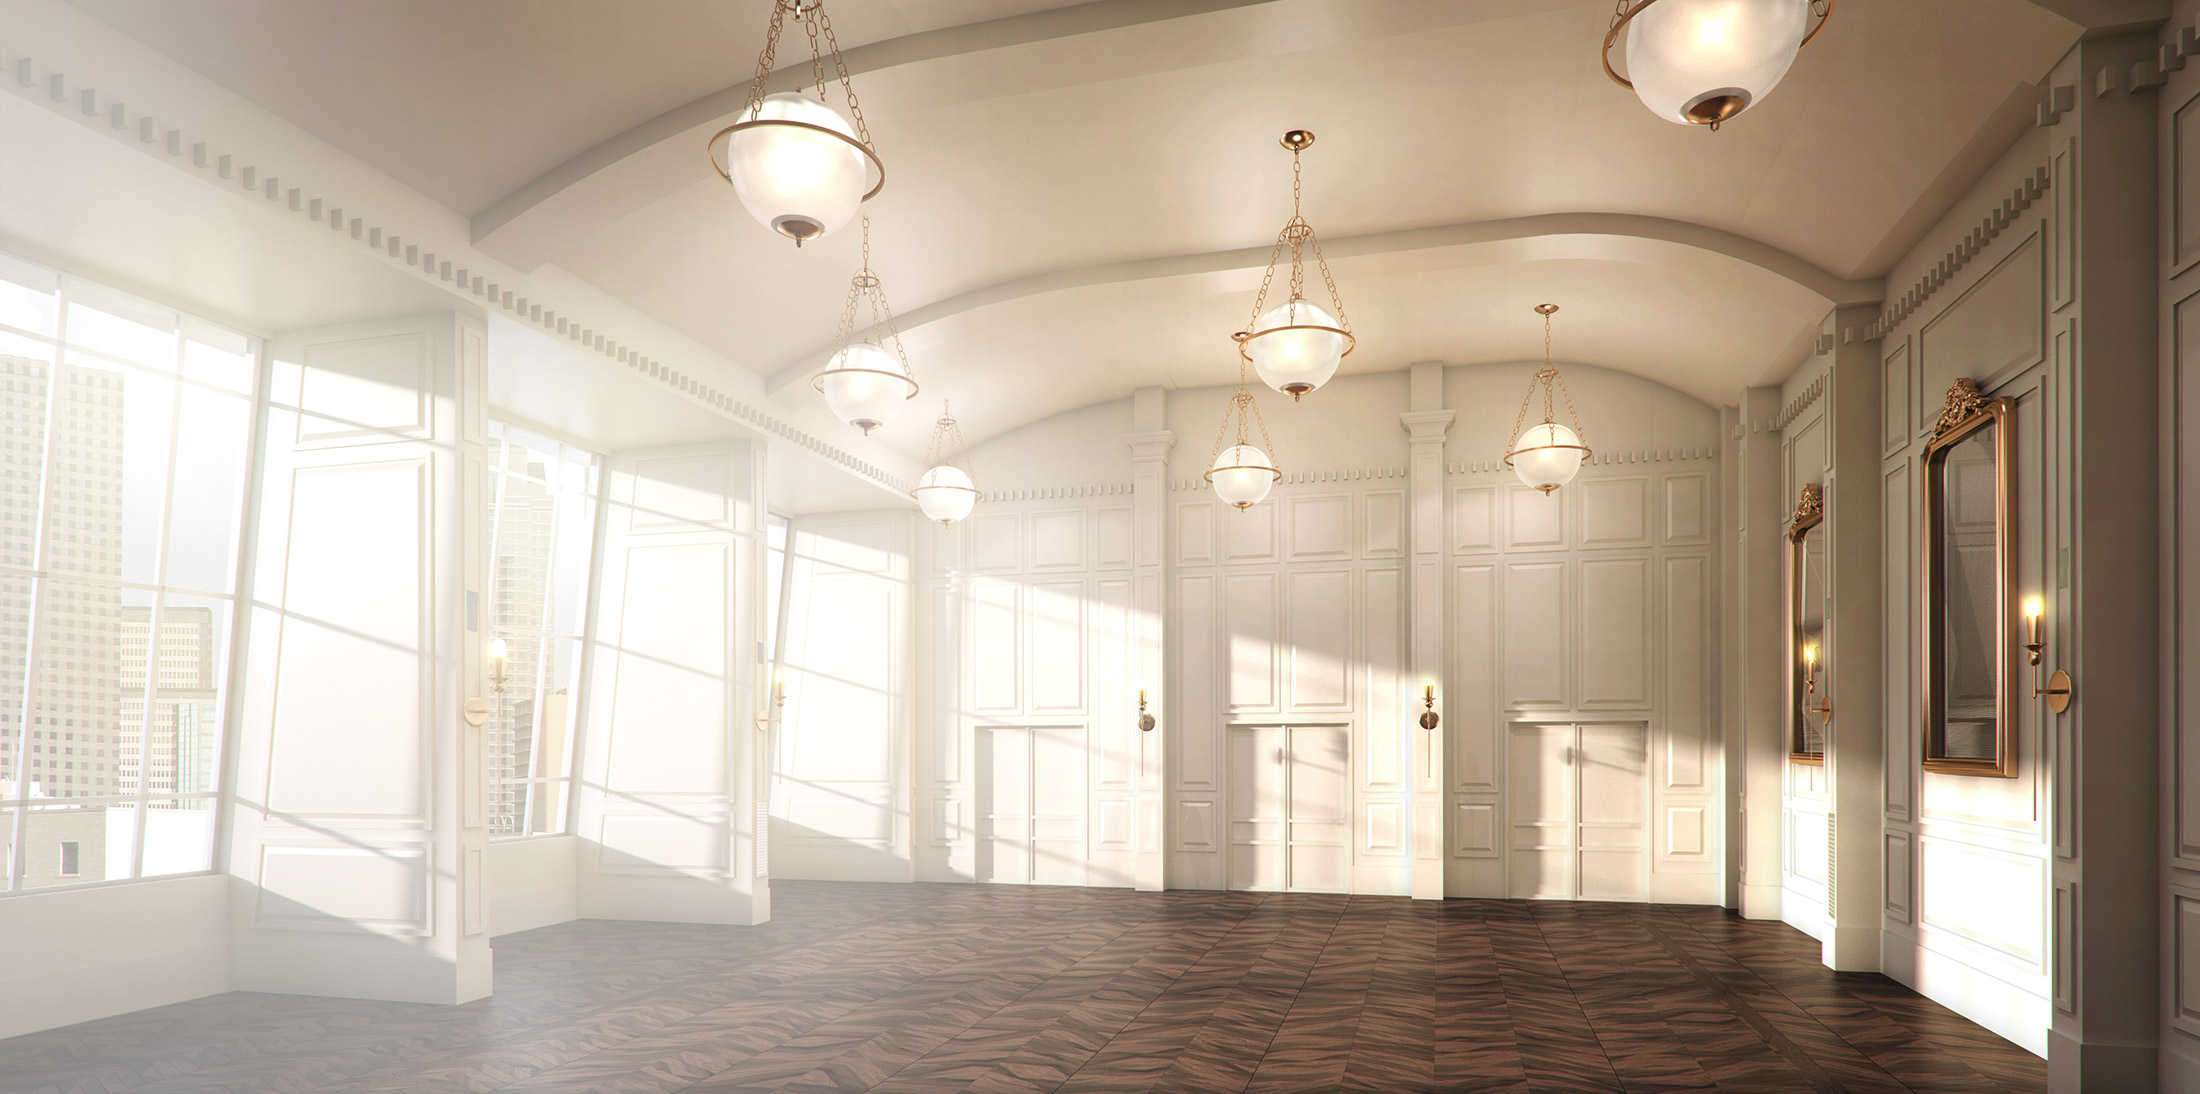 The 19th floor ballroom today